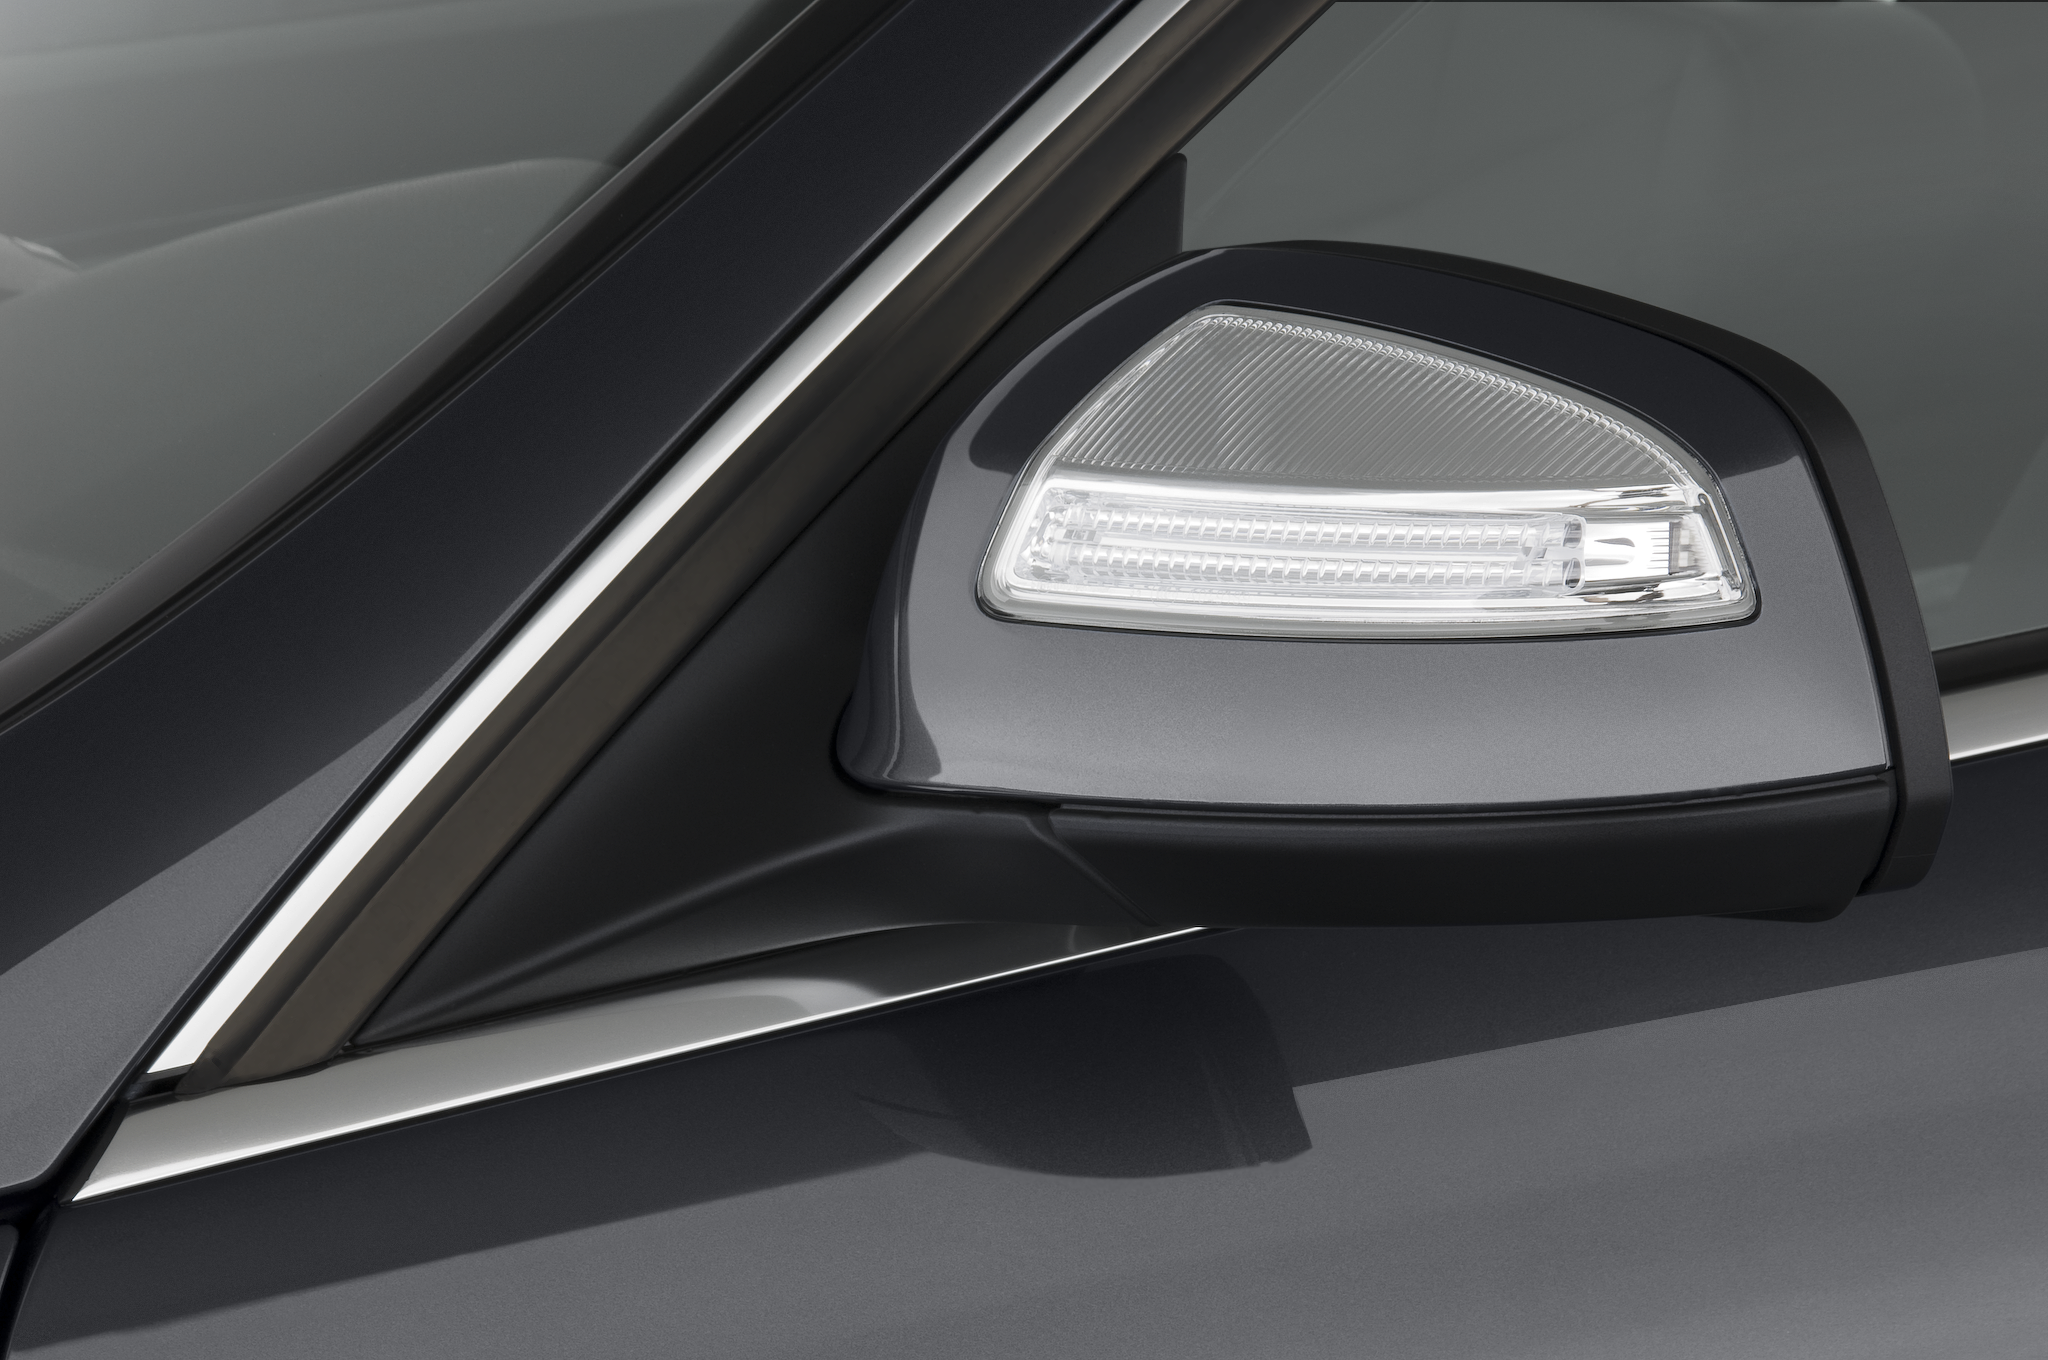 2010 mercedes benz c63 amg automobile magazine for Mercedes benz side mirror price